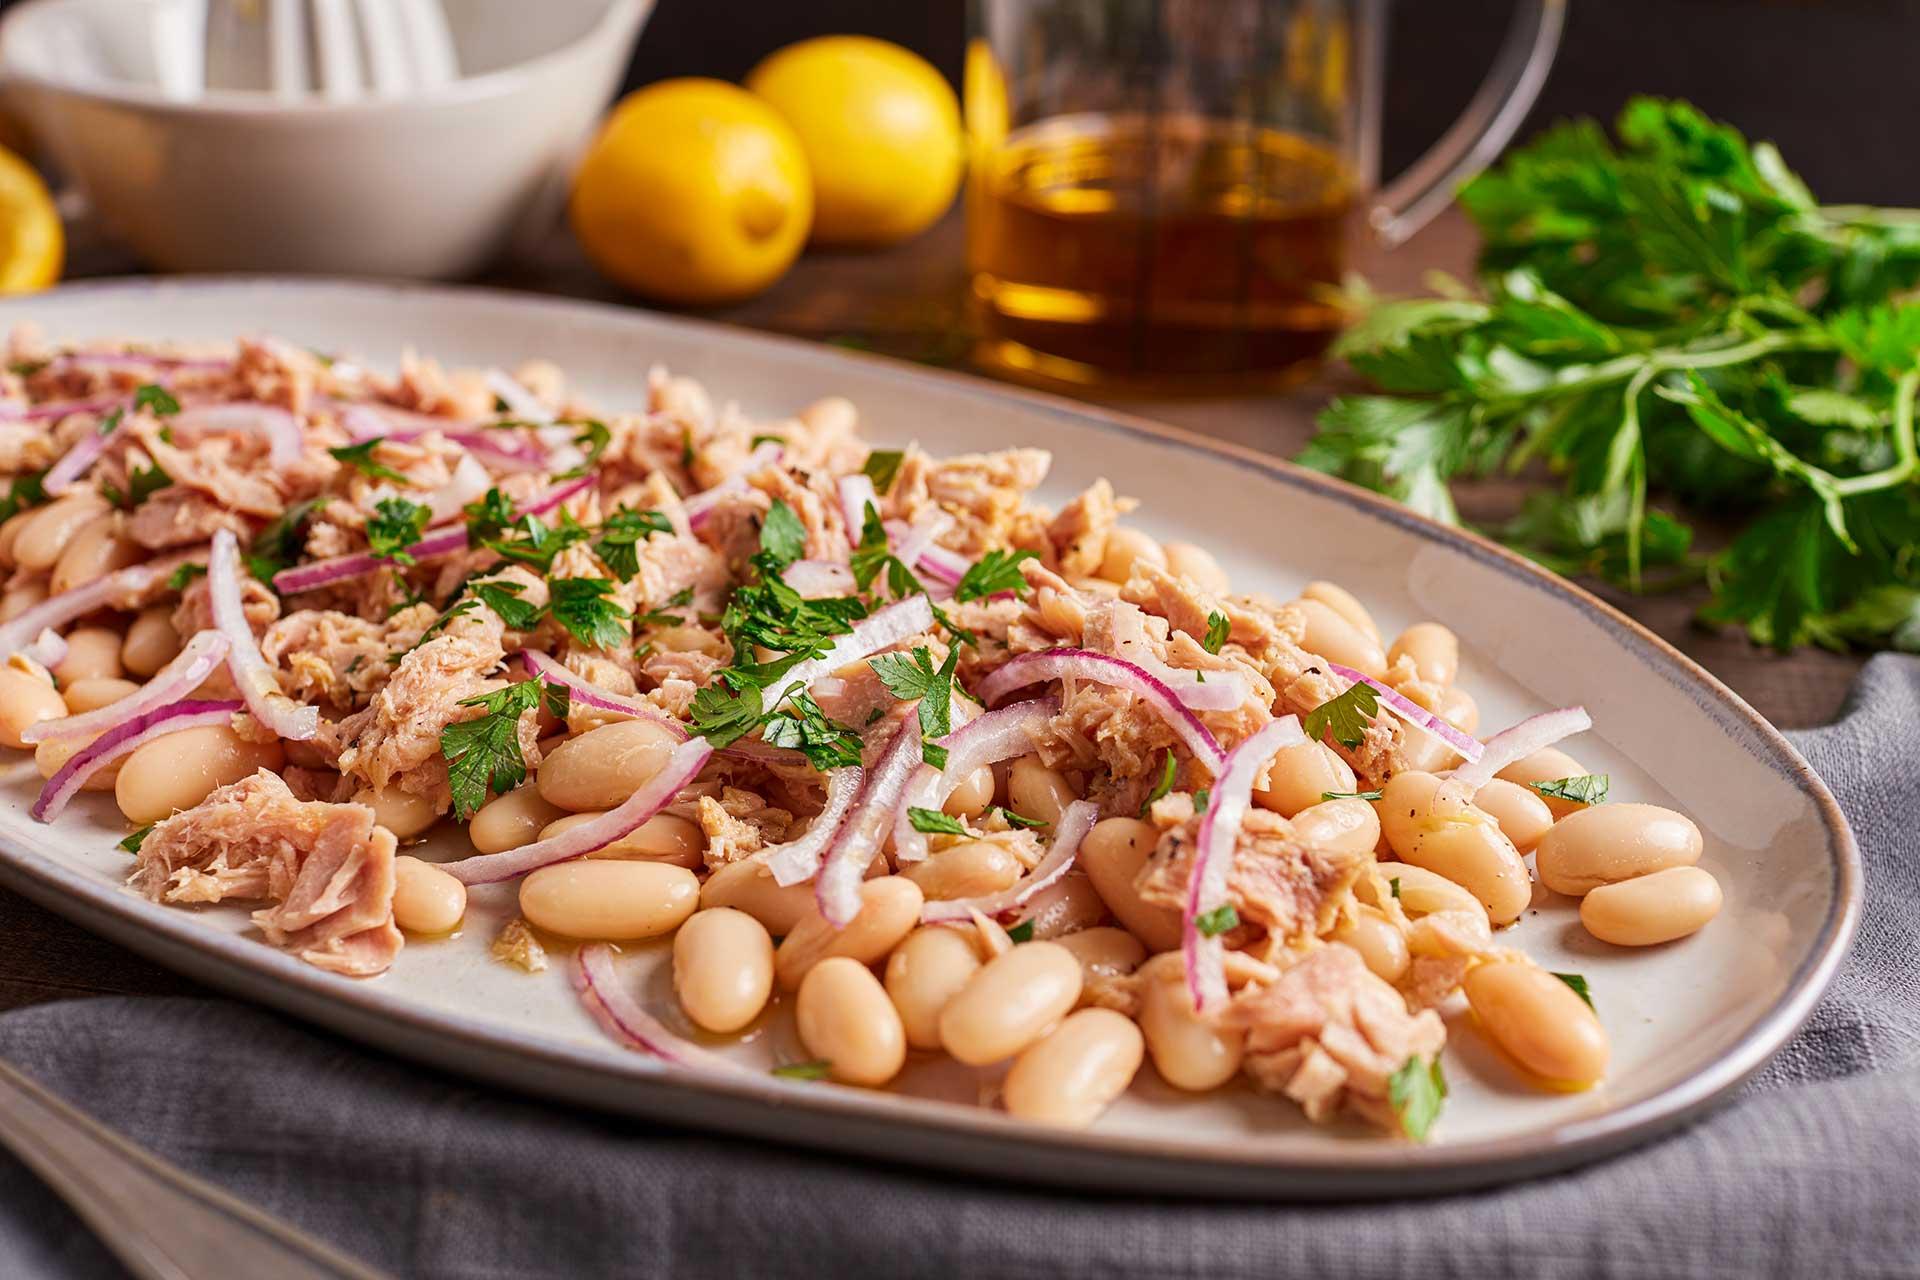 Beans and Tuna Salad (Italy)